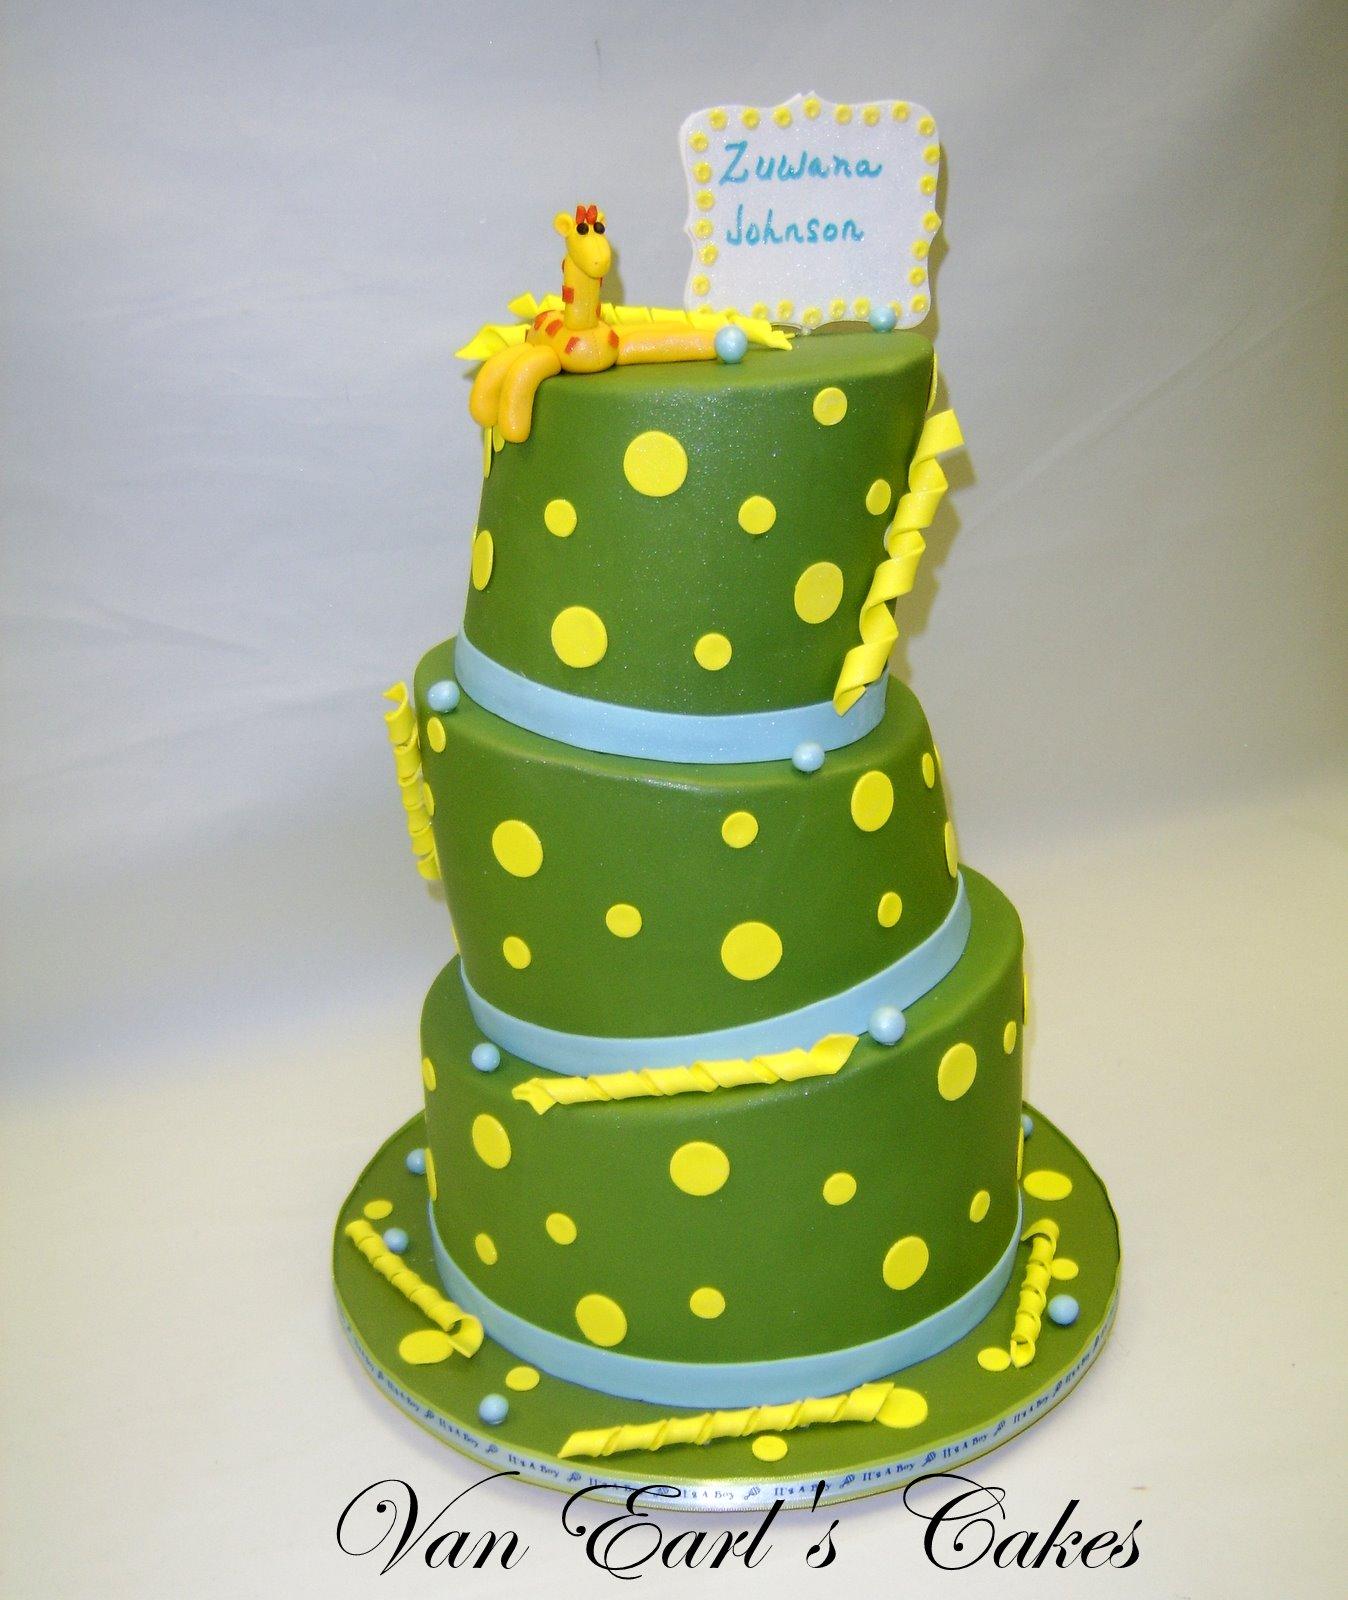 van earl 39 s cakes topsy turvy giraffe baby shower cake